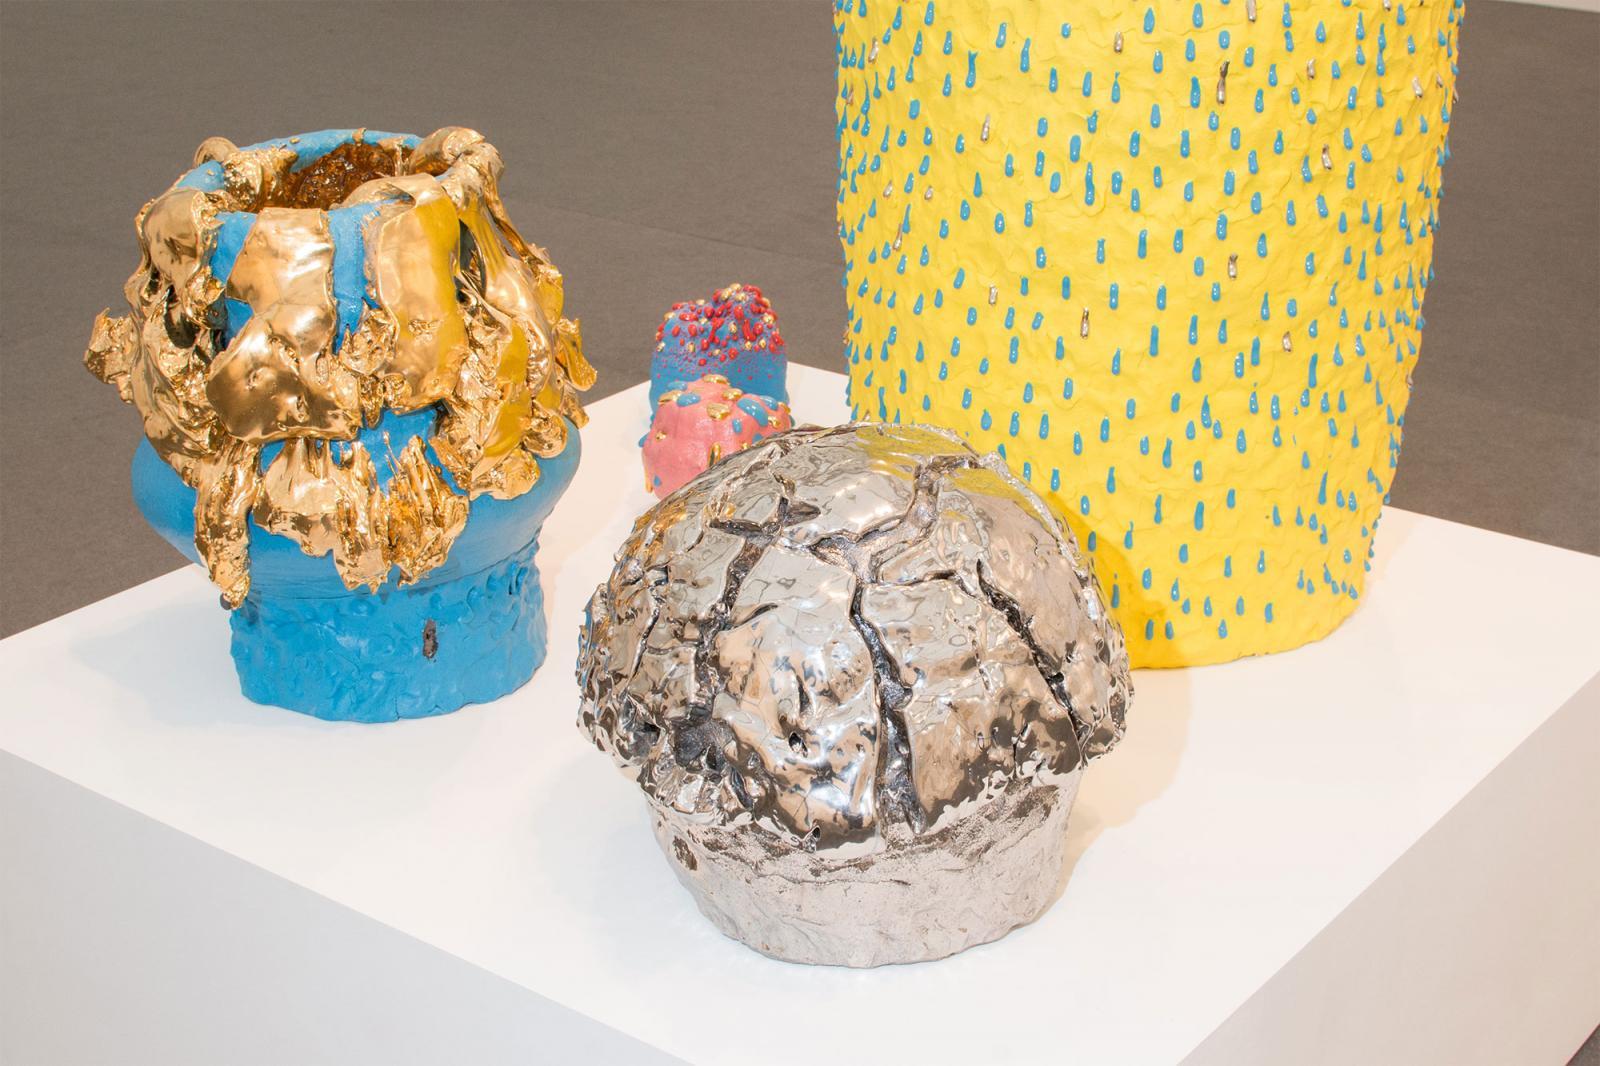 Takuro Kuwata at Alison Jacques Gallery